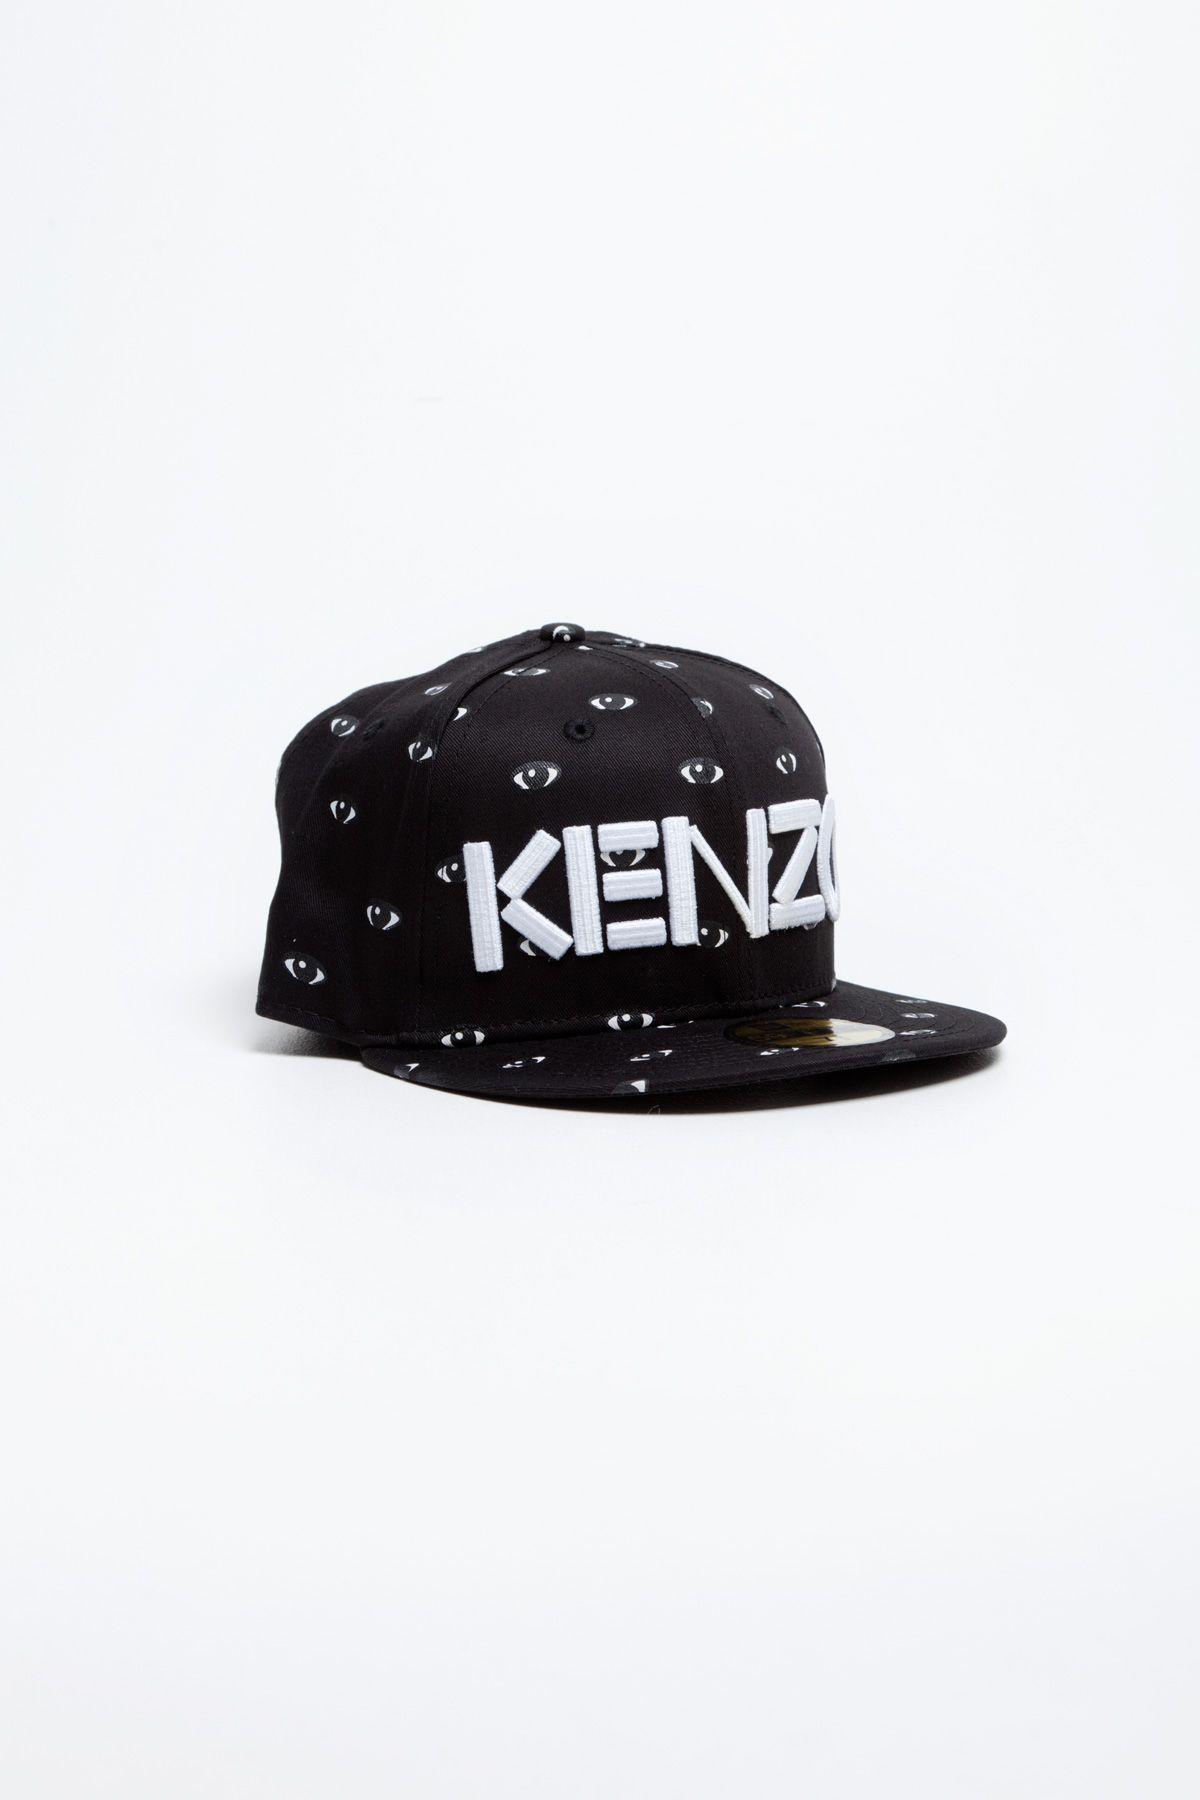 Kenzo - New Era Cap All Over Eyes Black  2e83bc5b491